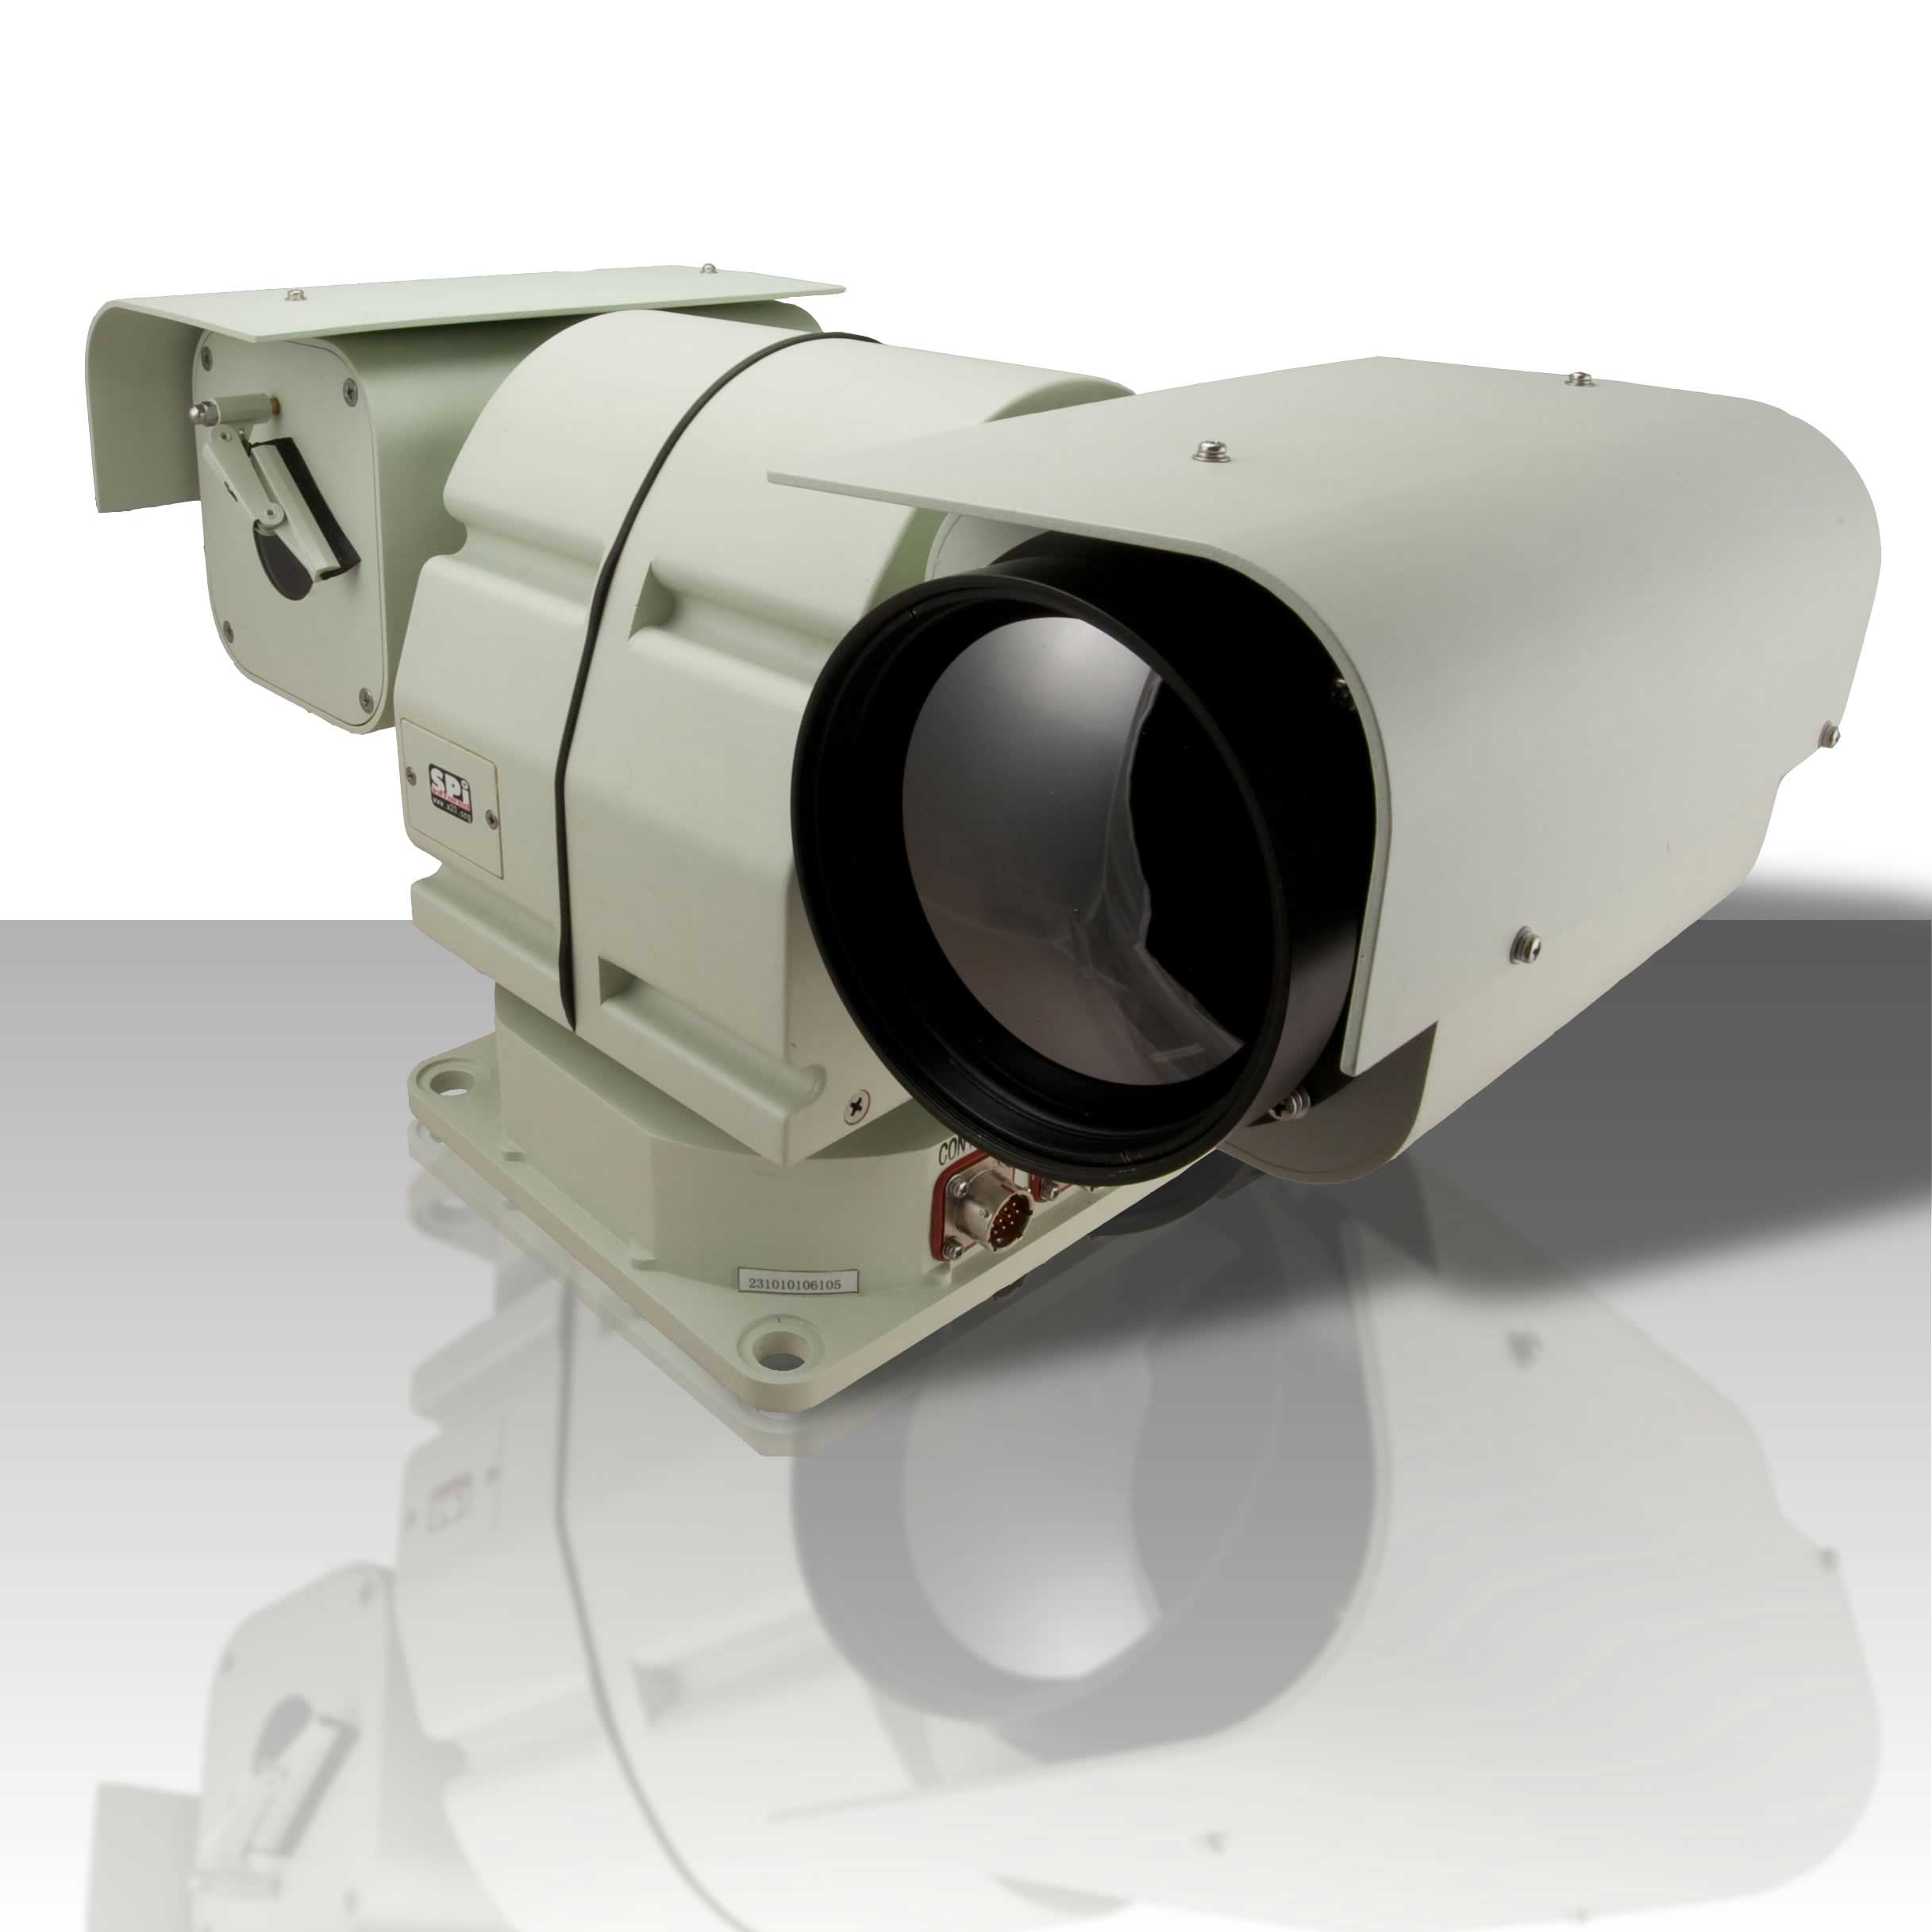 M5 Long Range Thermal Security Camera for Border Patrol